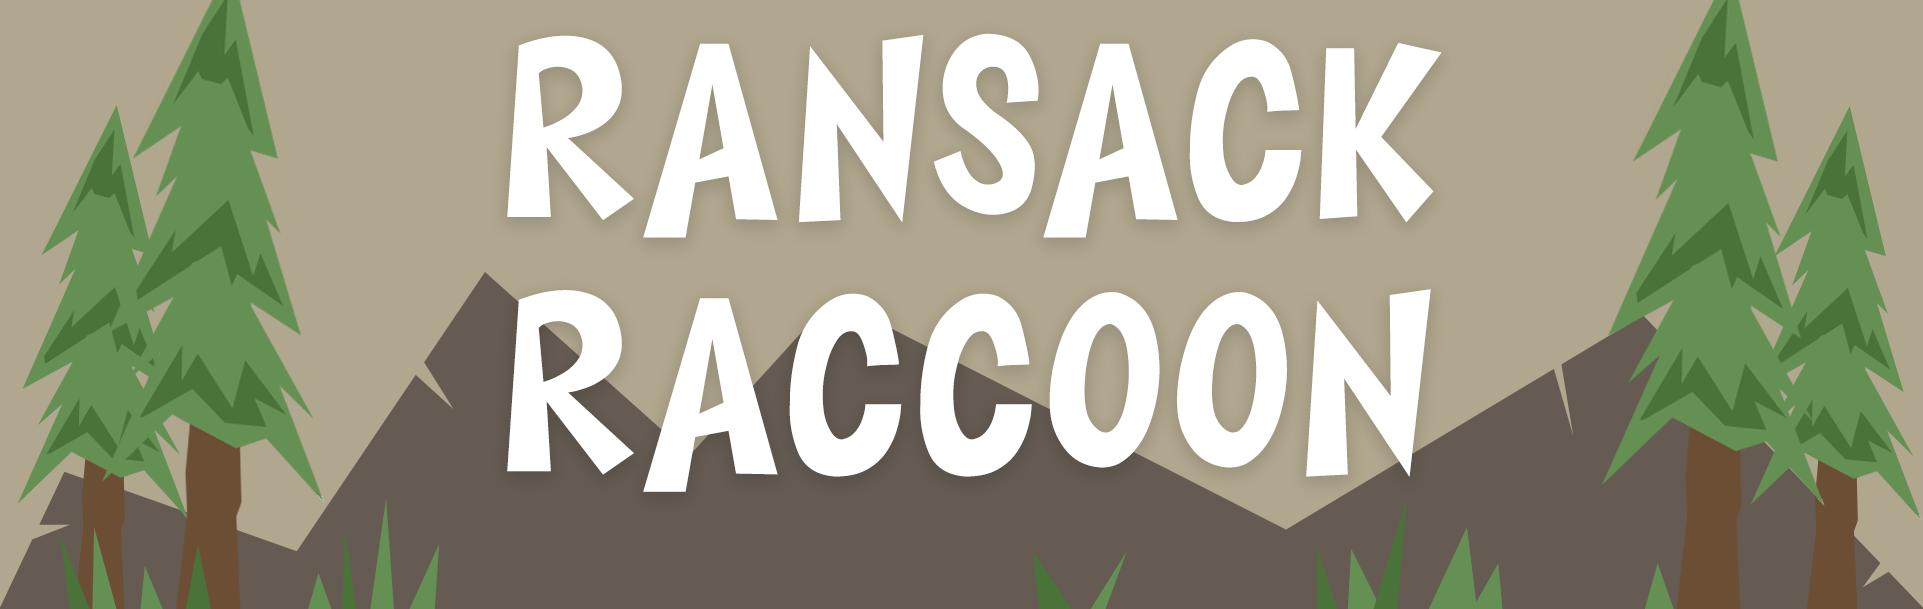 Ransack Raccoon